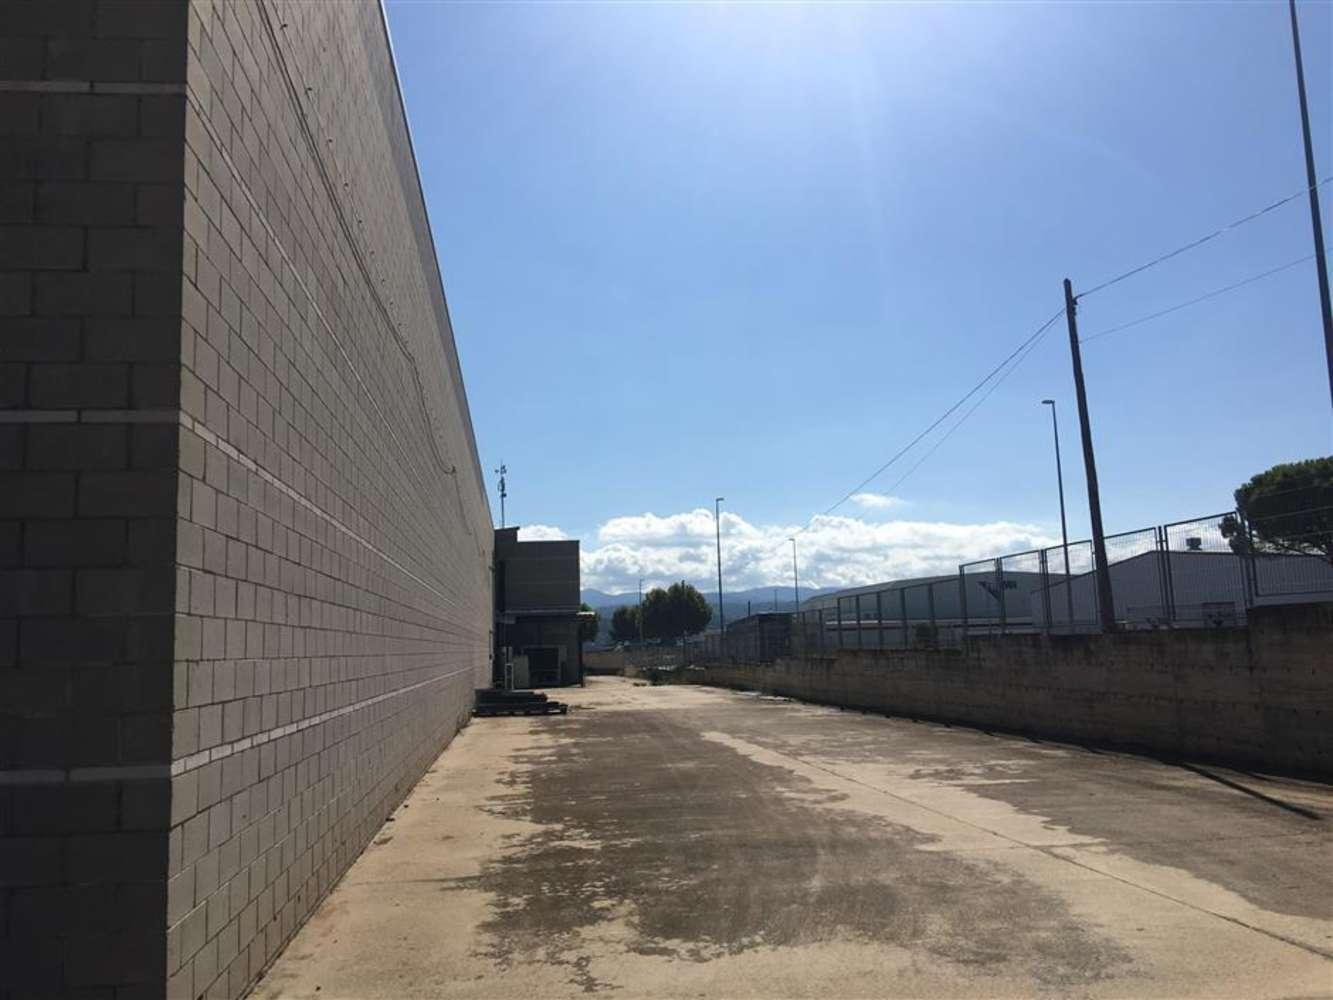 Naves industriales y logísticas Sant fruitós de bages, 08272 - Nave Logística - B0425 - PI SANT ISIDRE - 8730